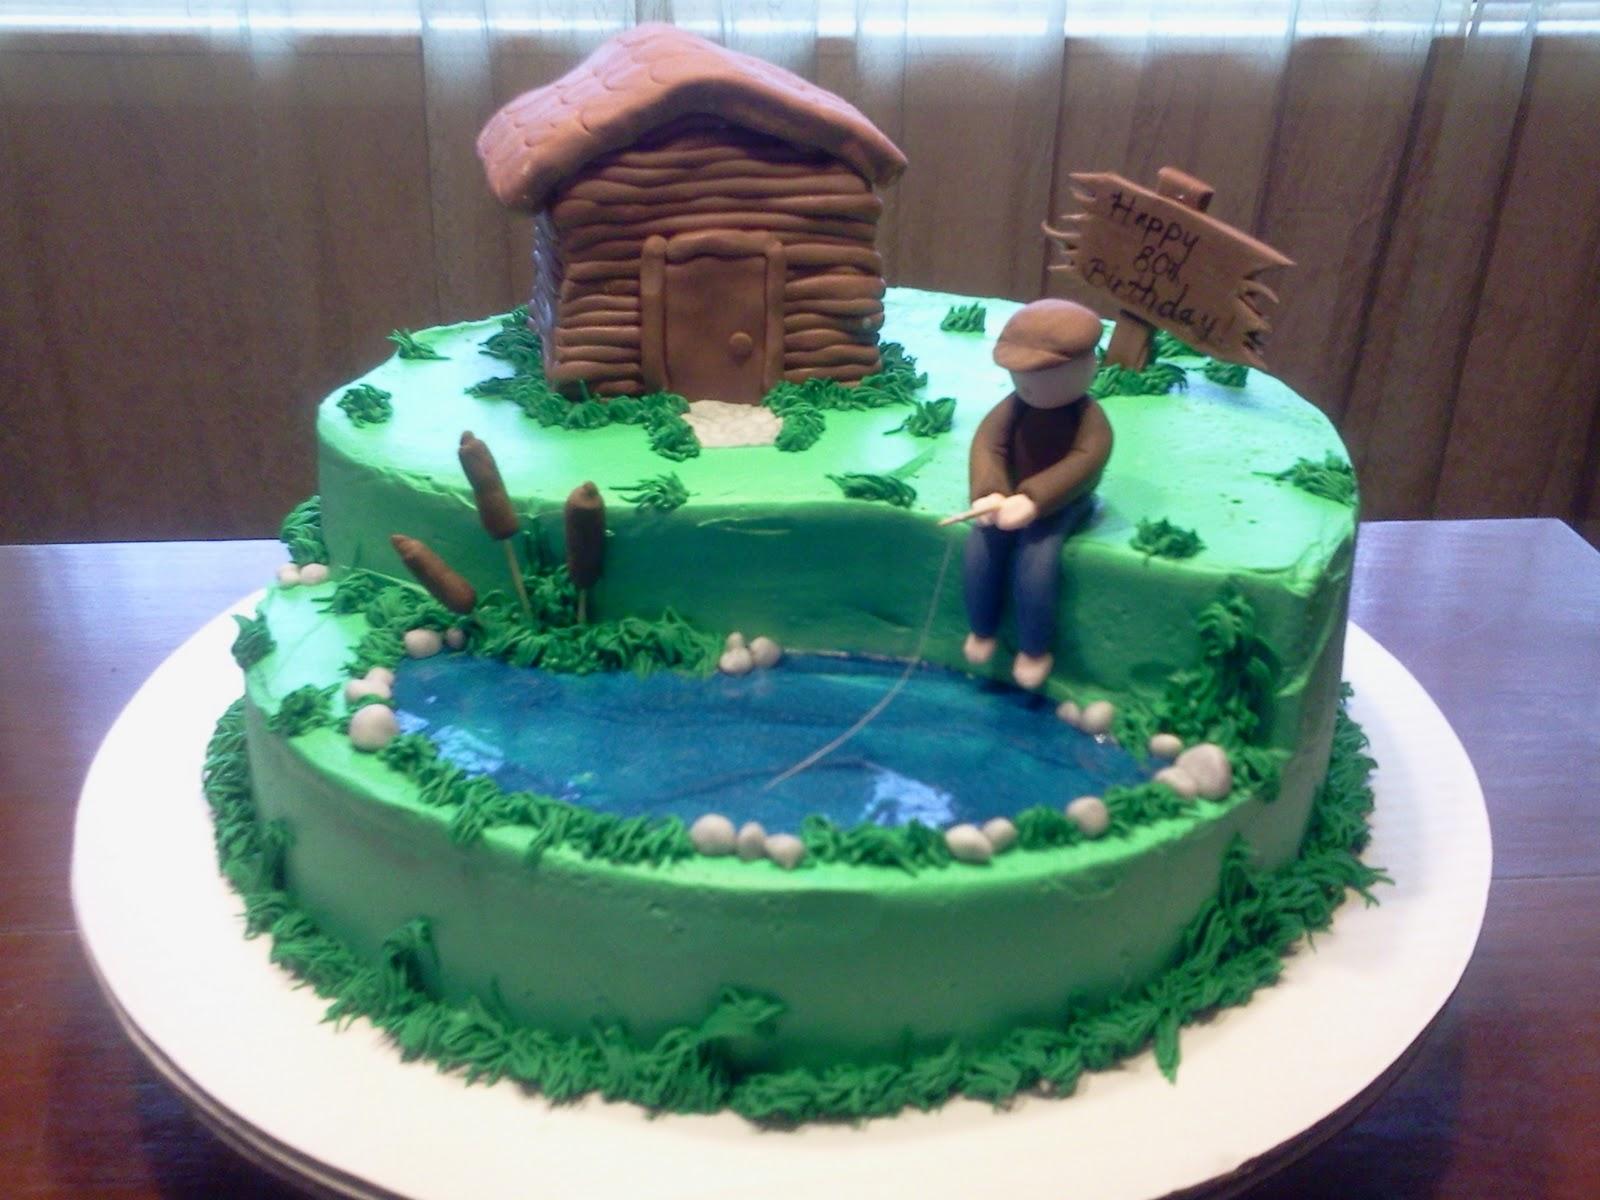 Edee's Custom Cakes: 80th fisherman birthday